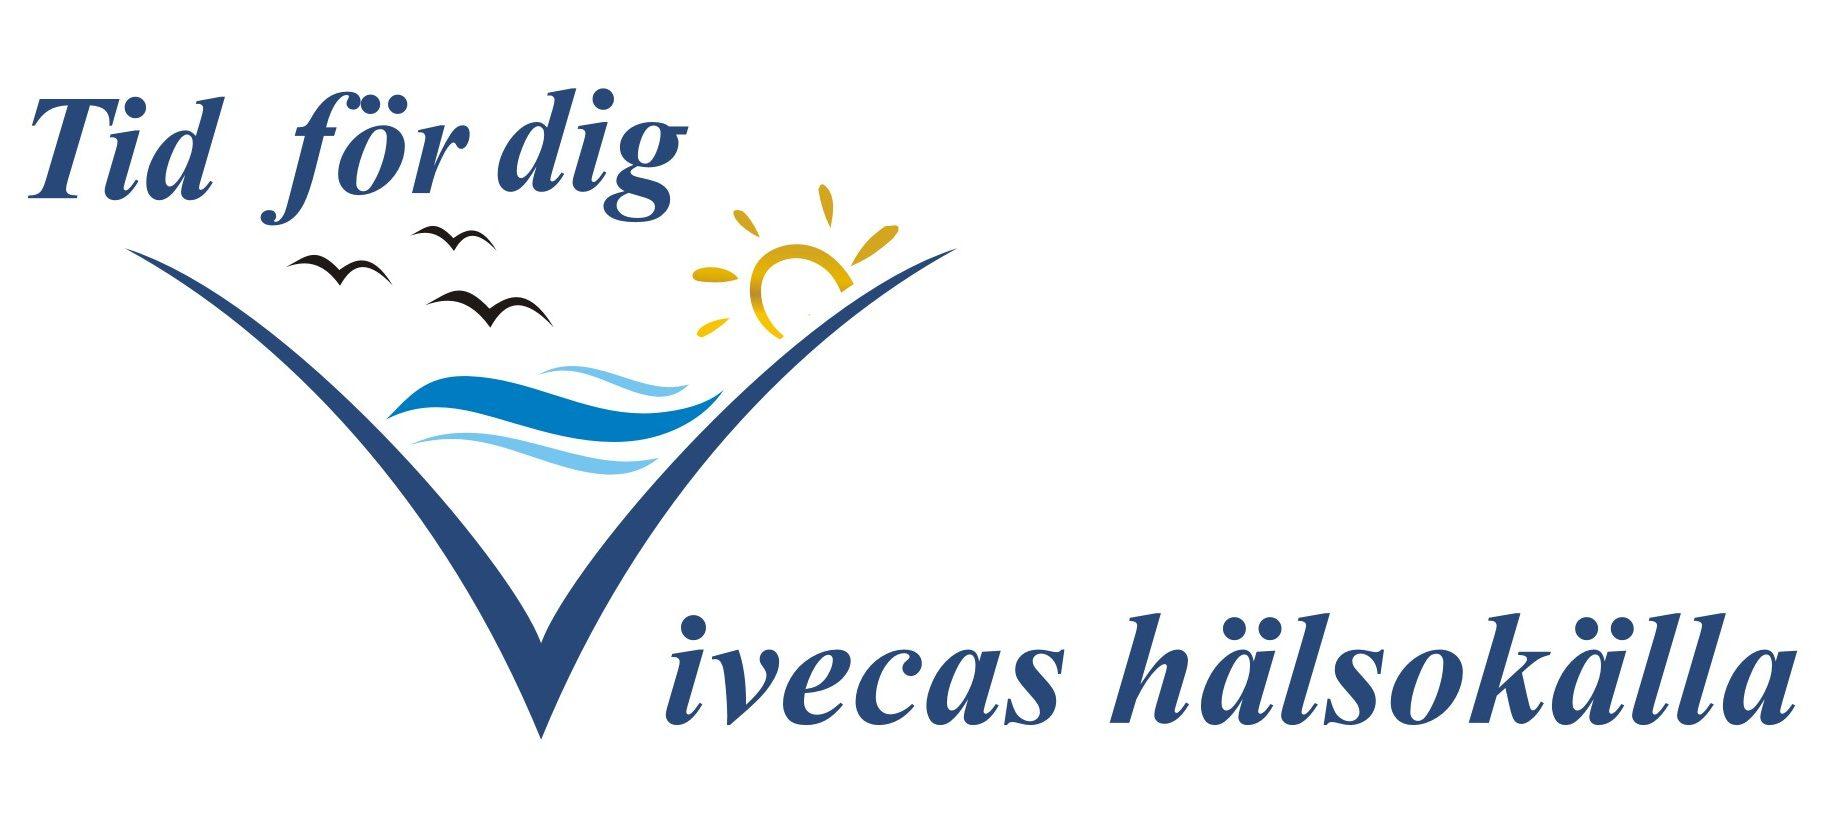 Vivecas Hälsokälla